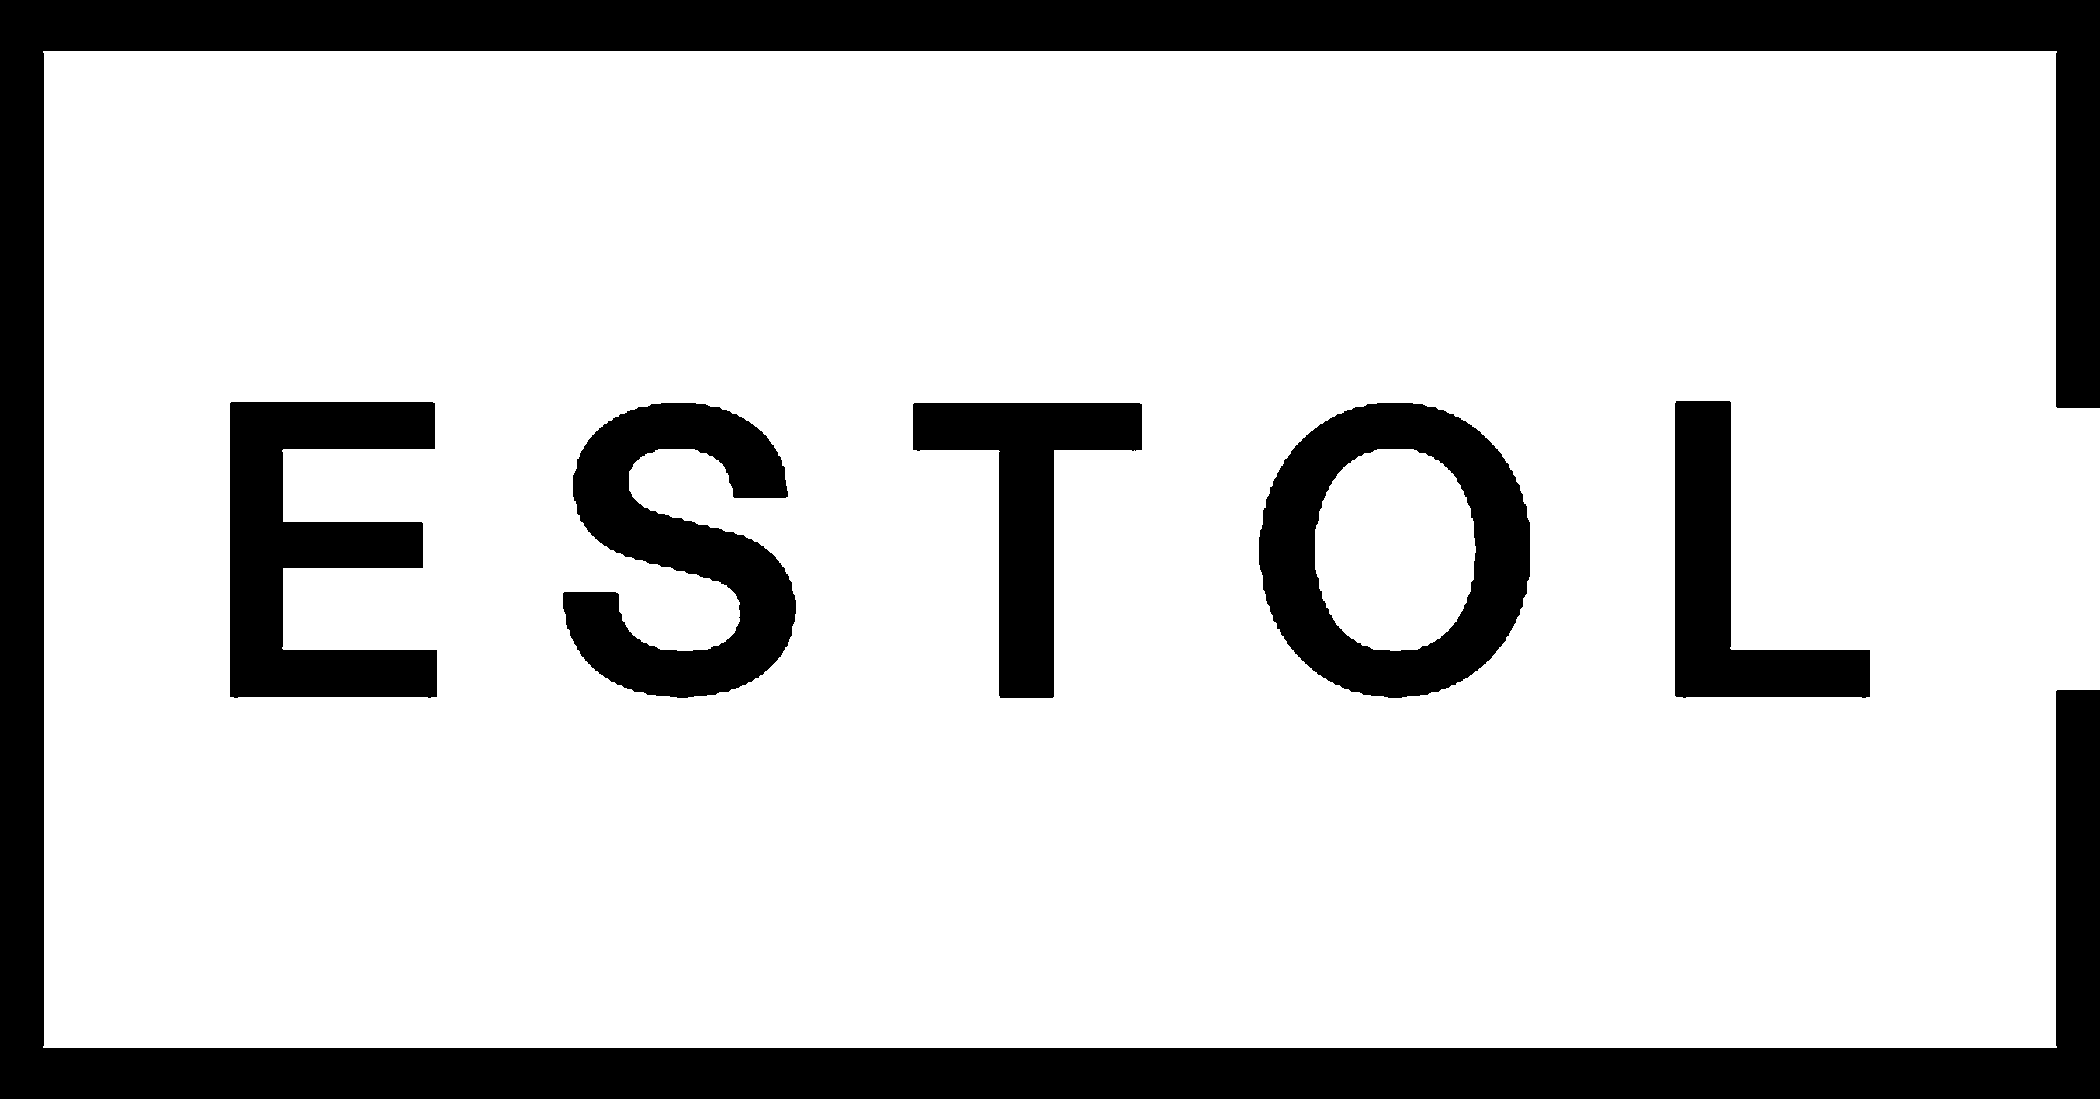 CARA ESTOL